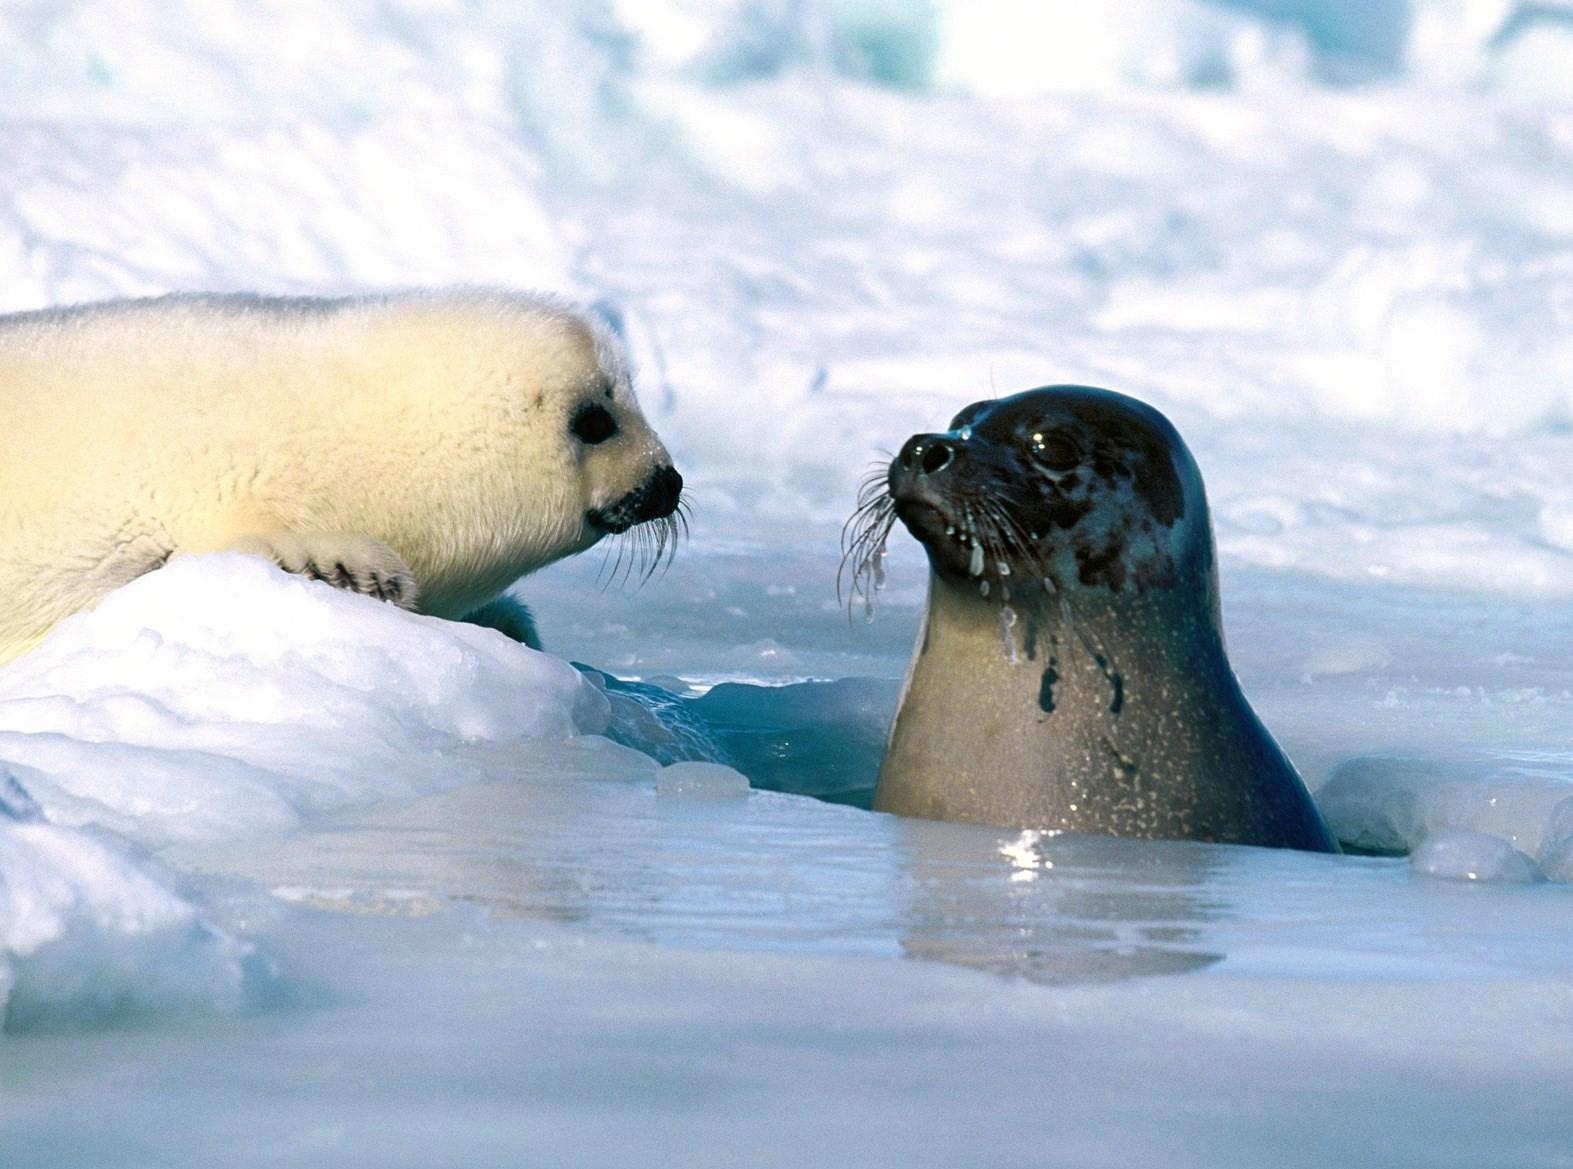 Edge Of The Plank: Cute Animals: Baby Harp Seals